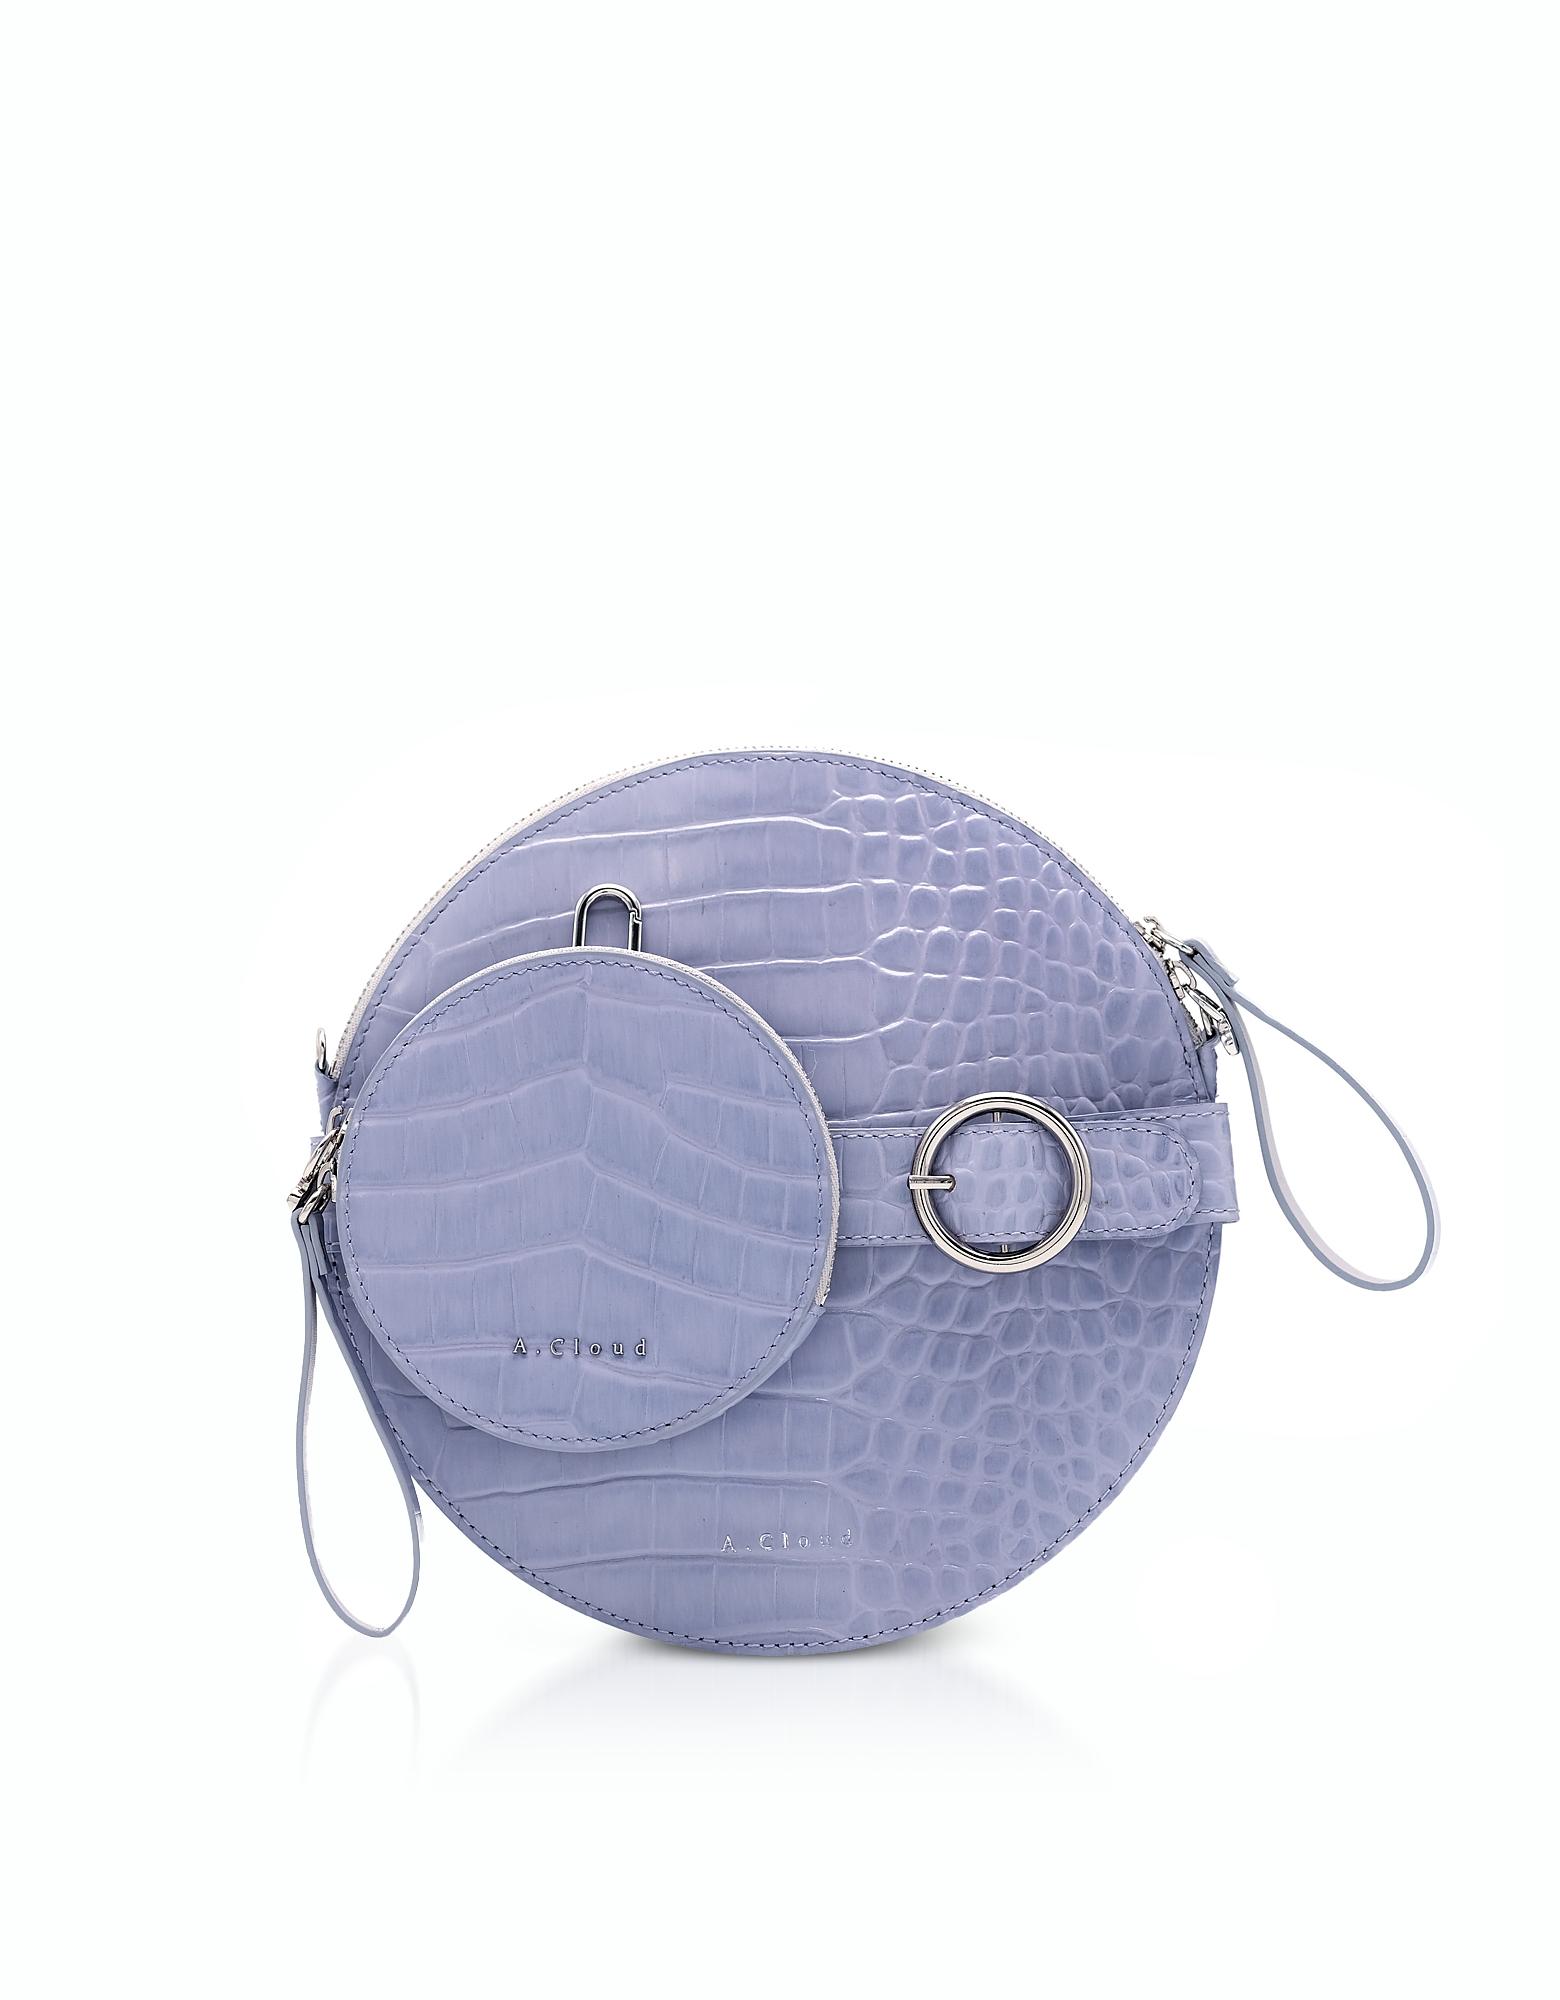 Forzieri coupon: A.Cloud  Handbags Moon/UFO Round Bag